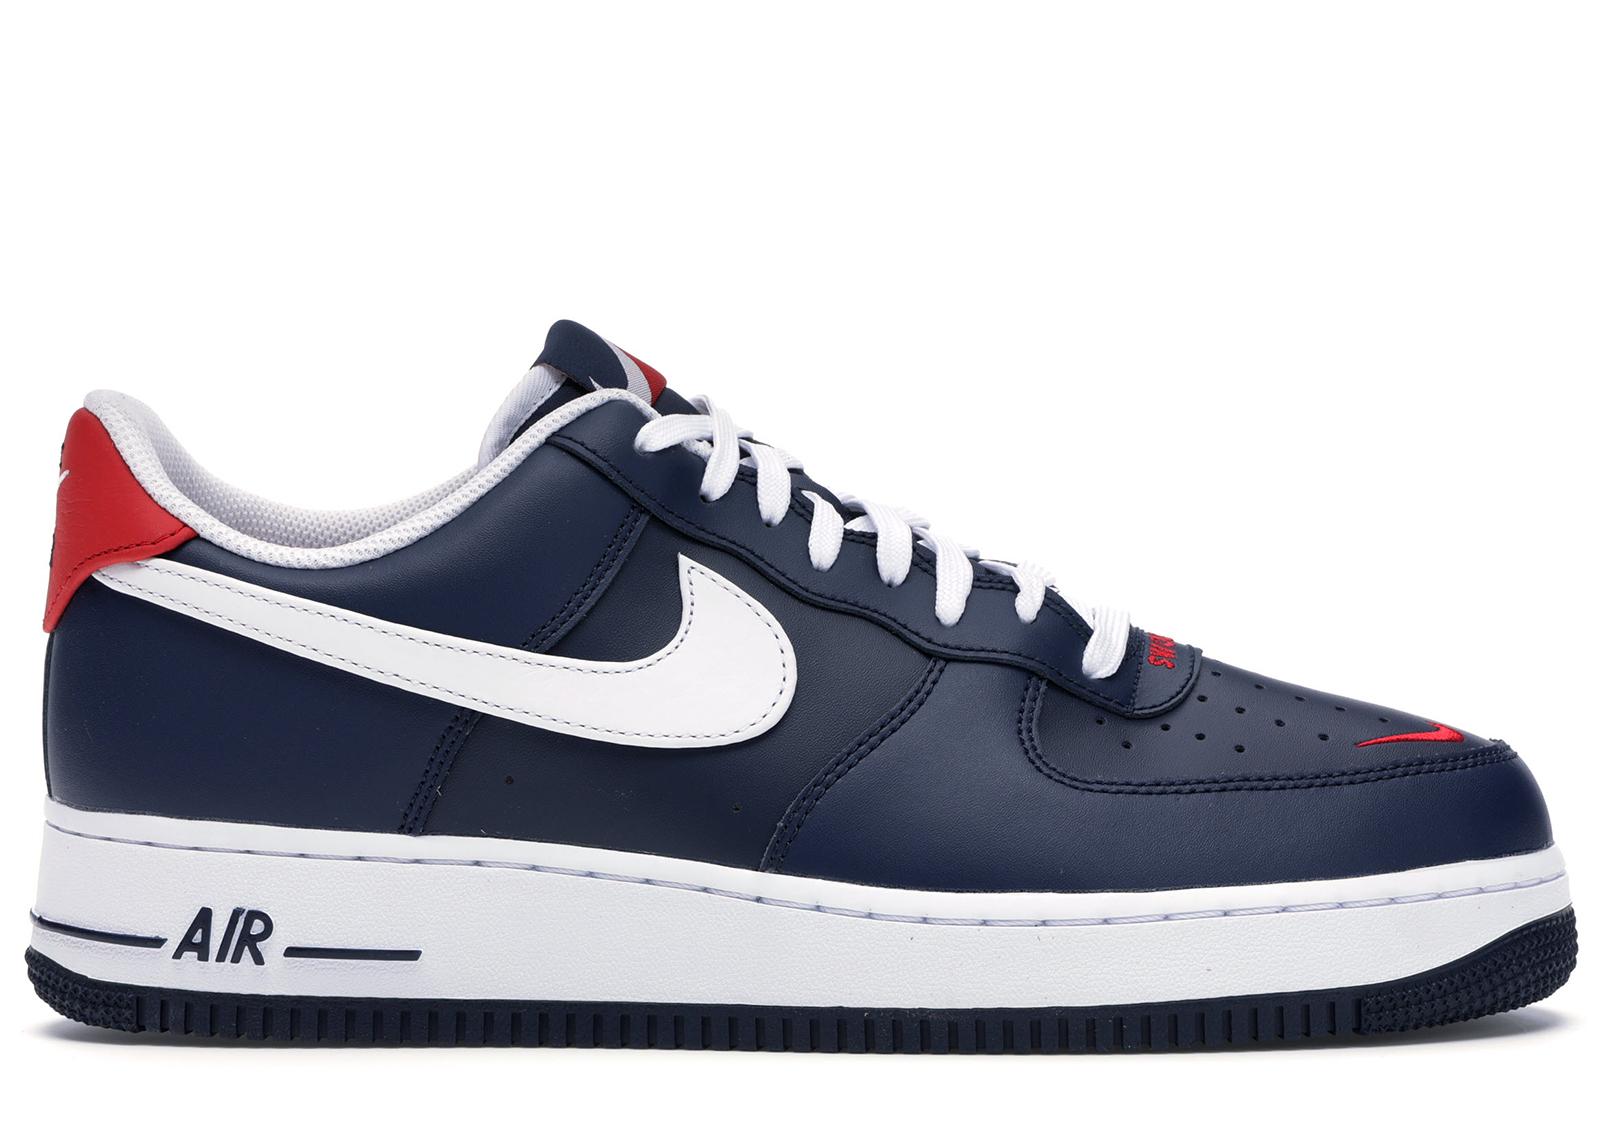 Nike Air Force 1 Low Swoosh Pack Navy -